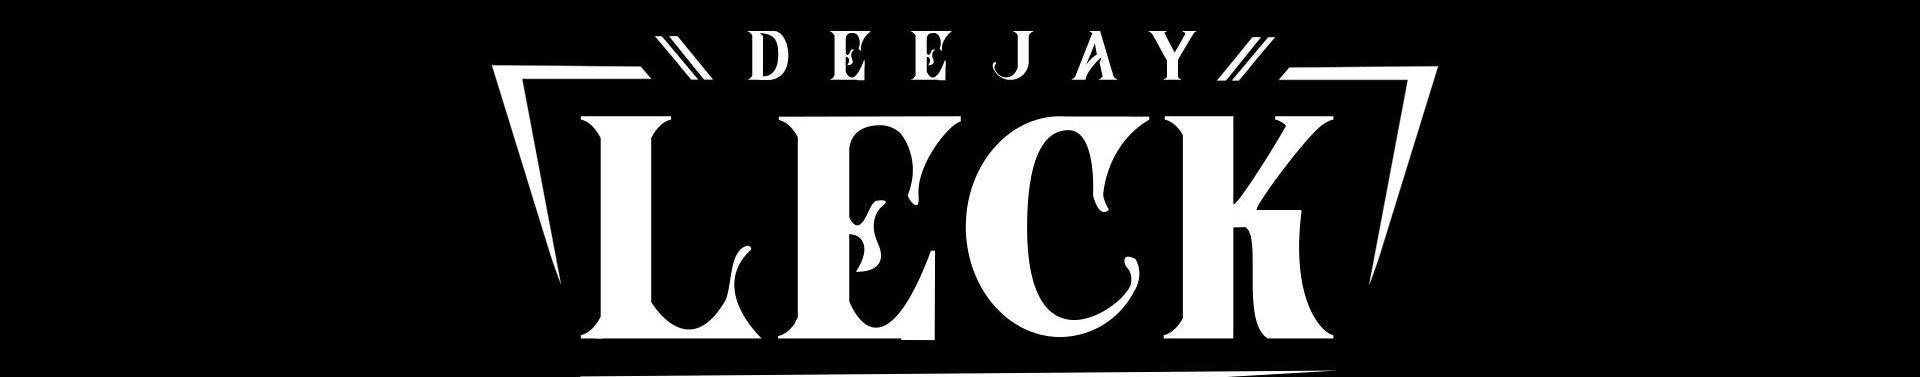 Imagem de capa de DJ LECK